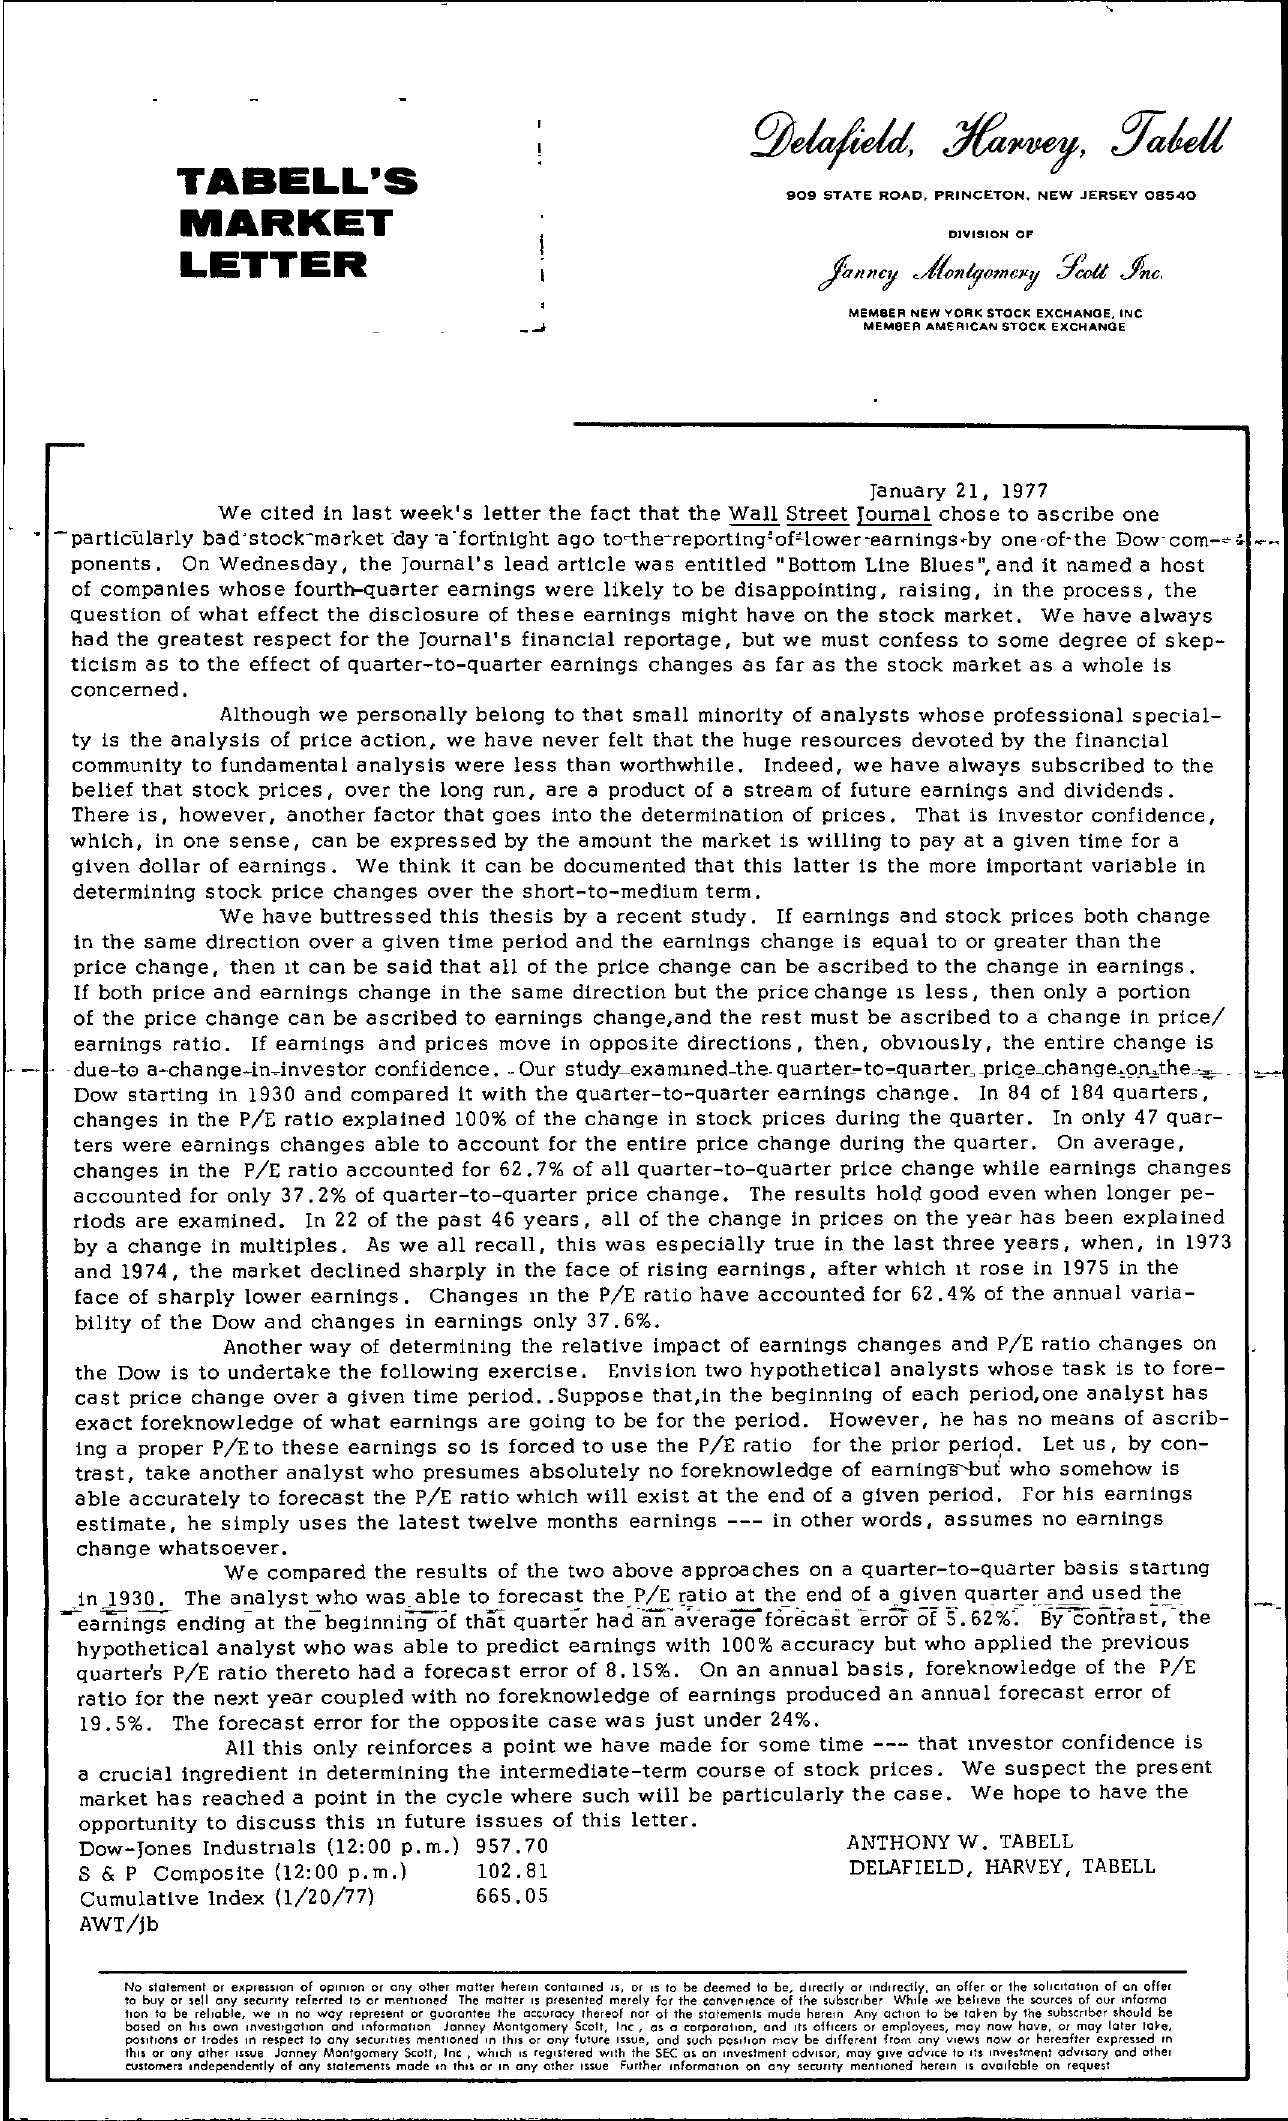 Tabell's Market Letter - January 21, 1977